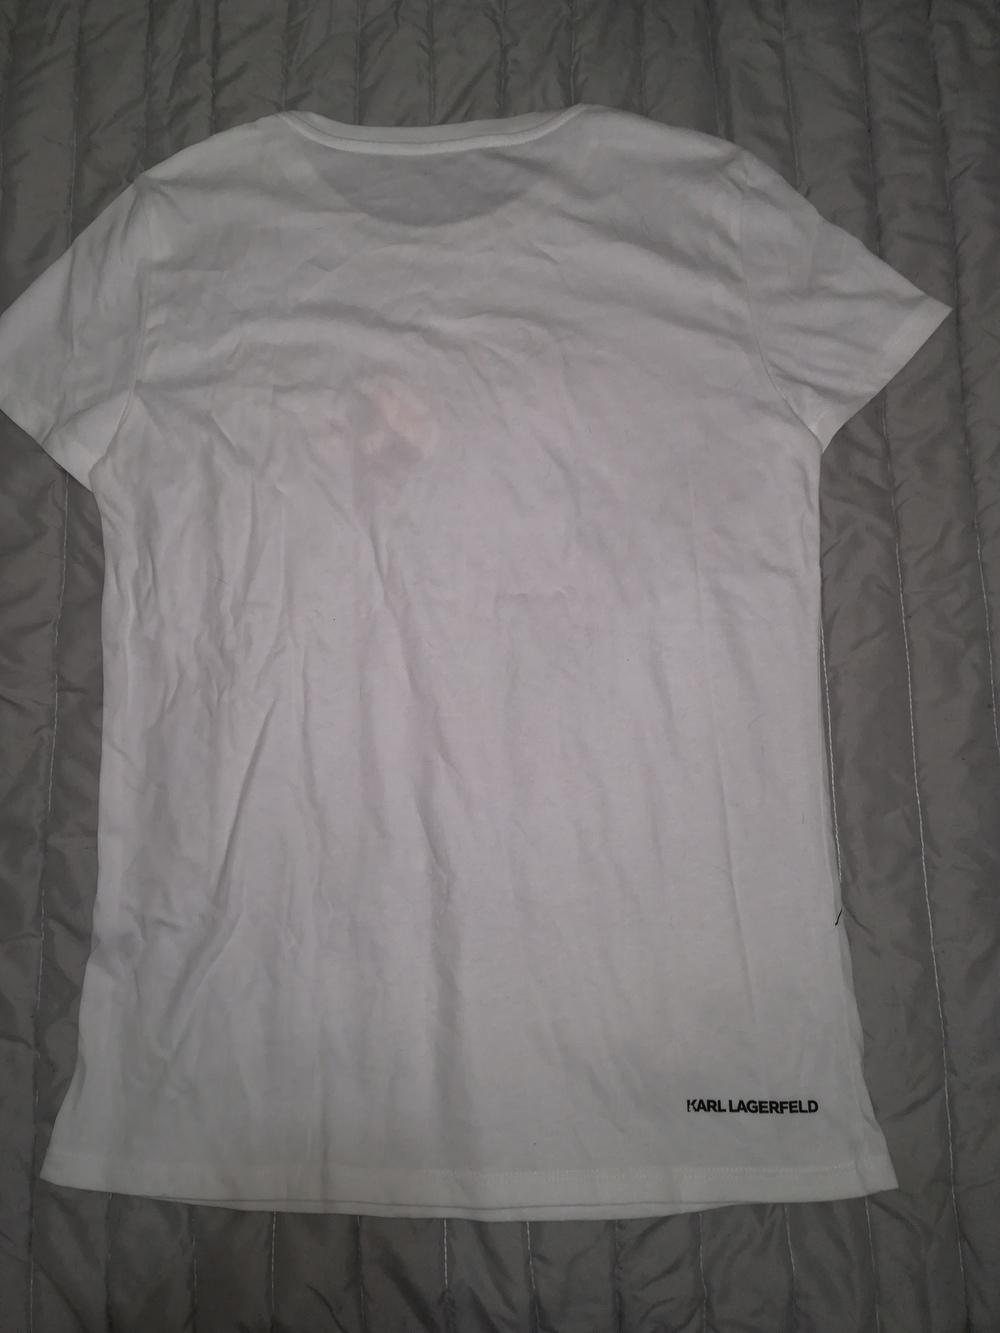 T-shirt Karl Lagerfeld 2